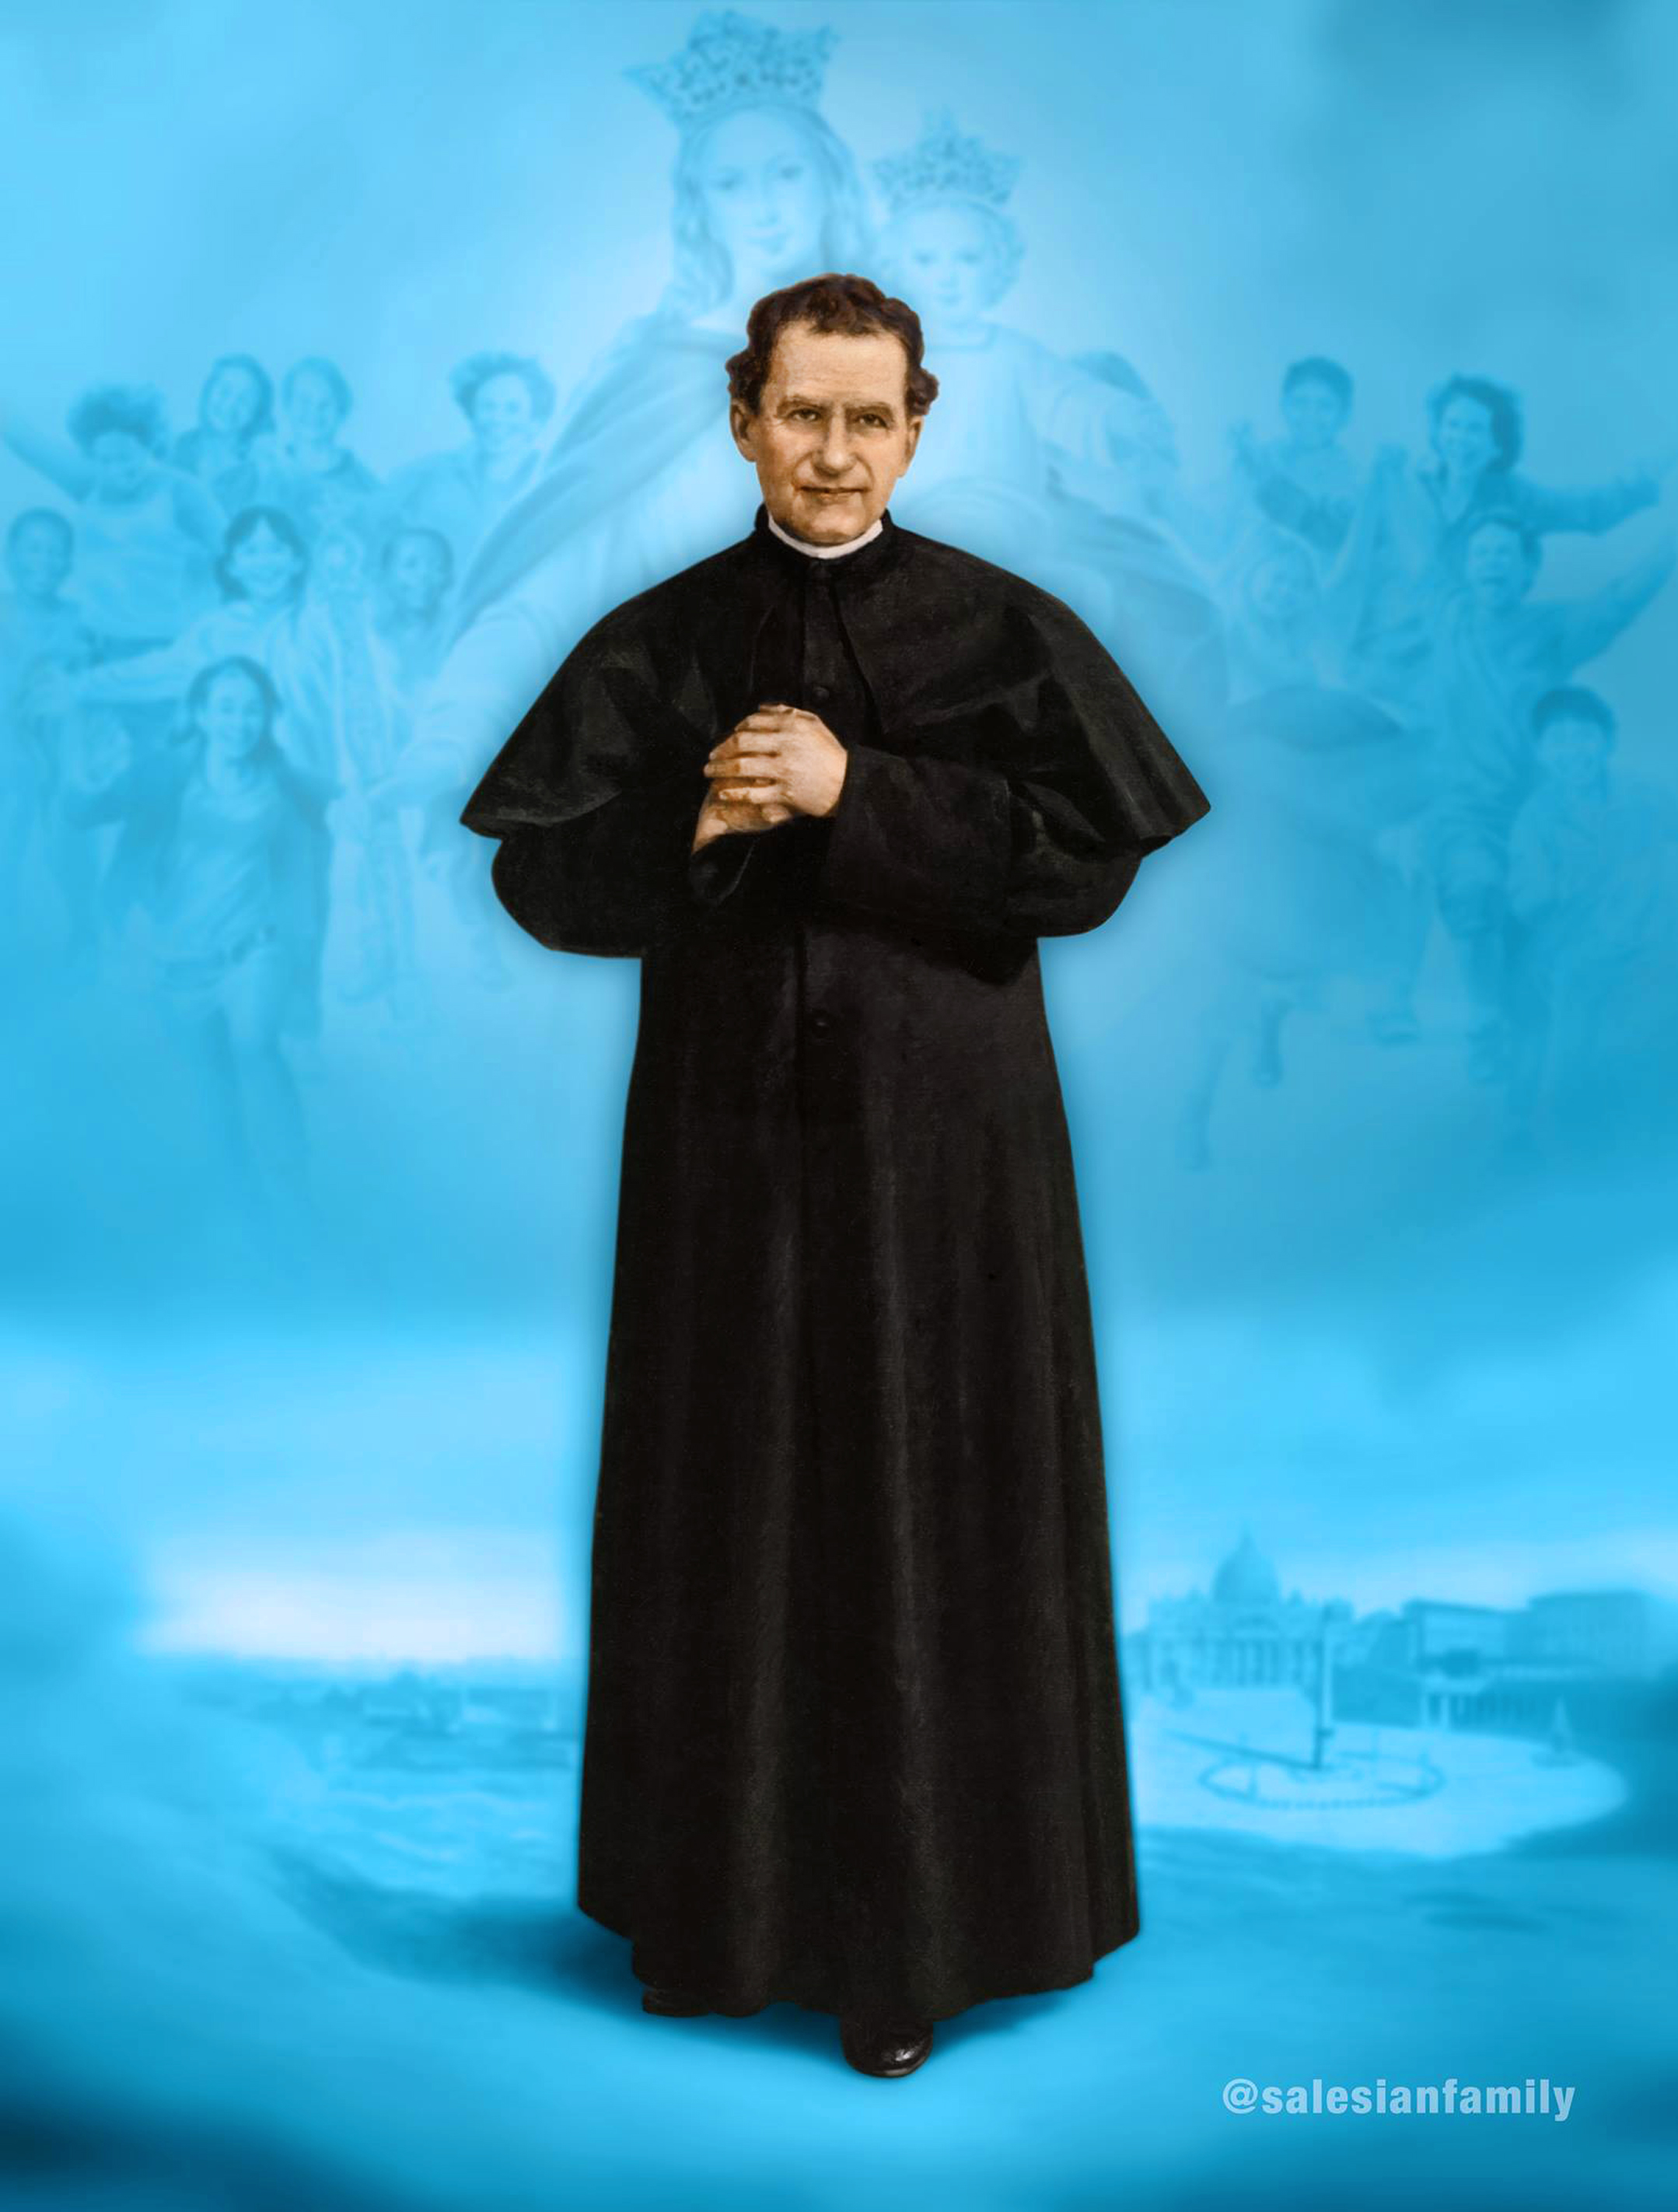 The Life Story of St  John Bosco (Biography of Don Bosco) | Salesian